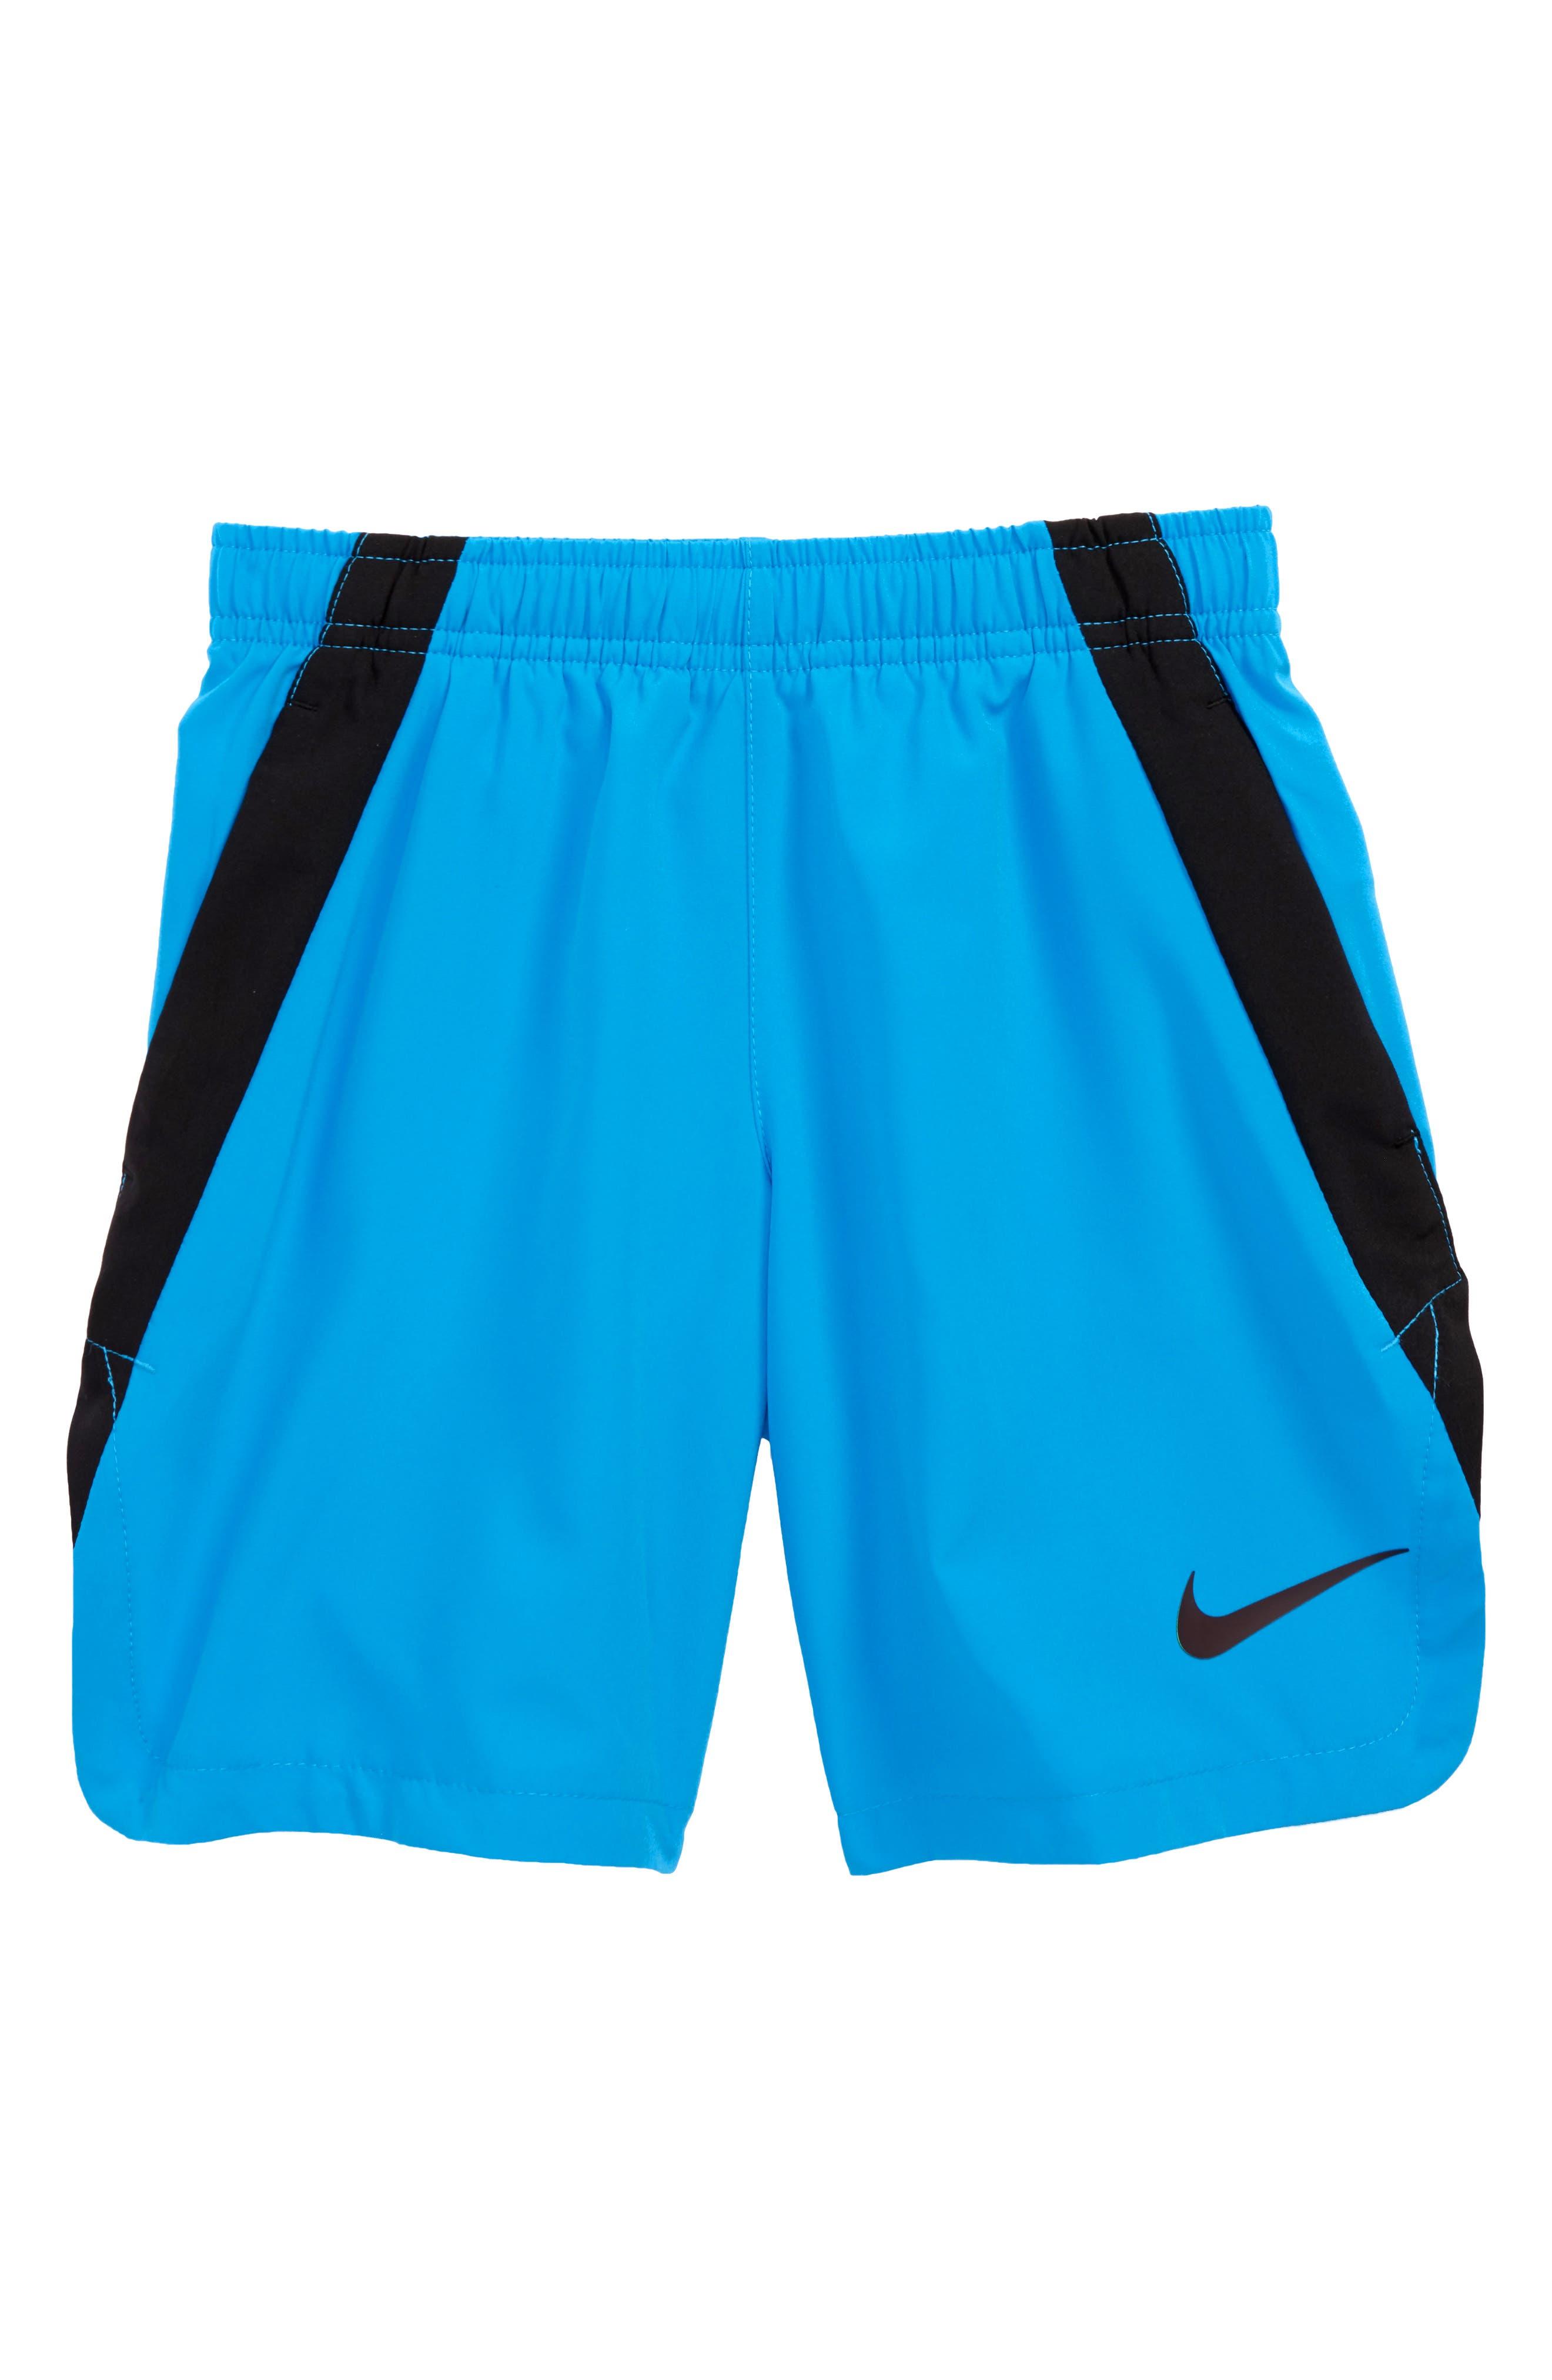 Dry Vent Shorts,                         Main,                         color, Equator Blue